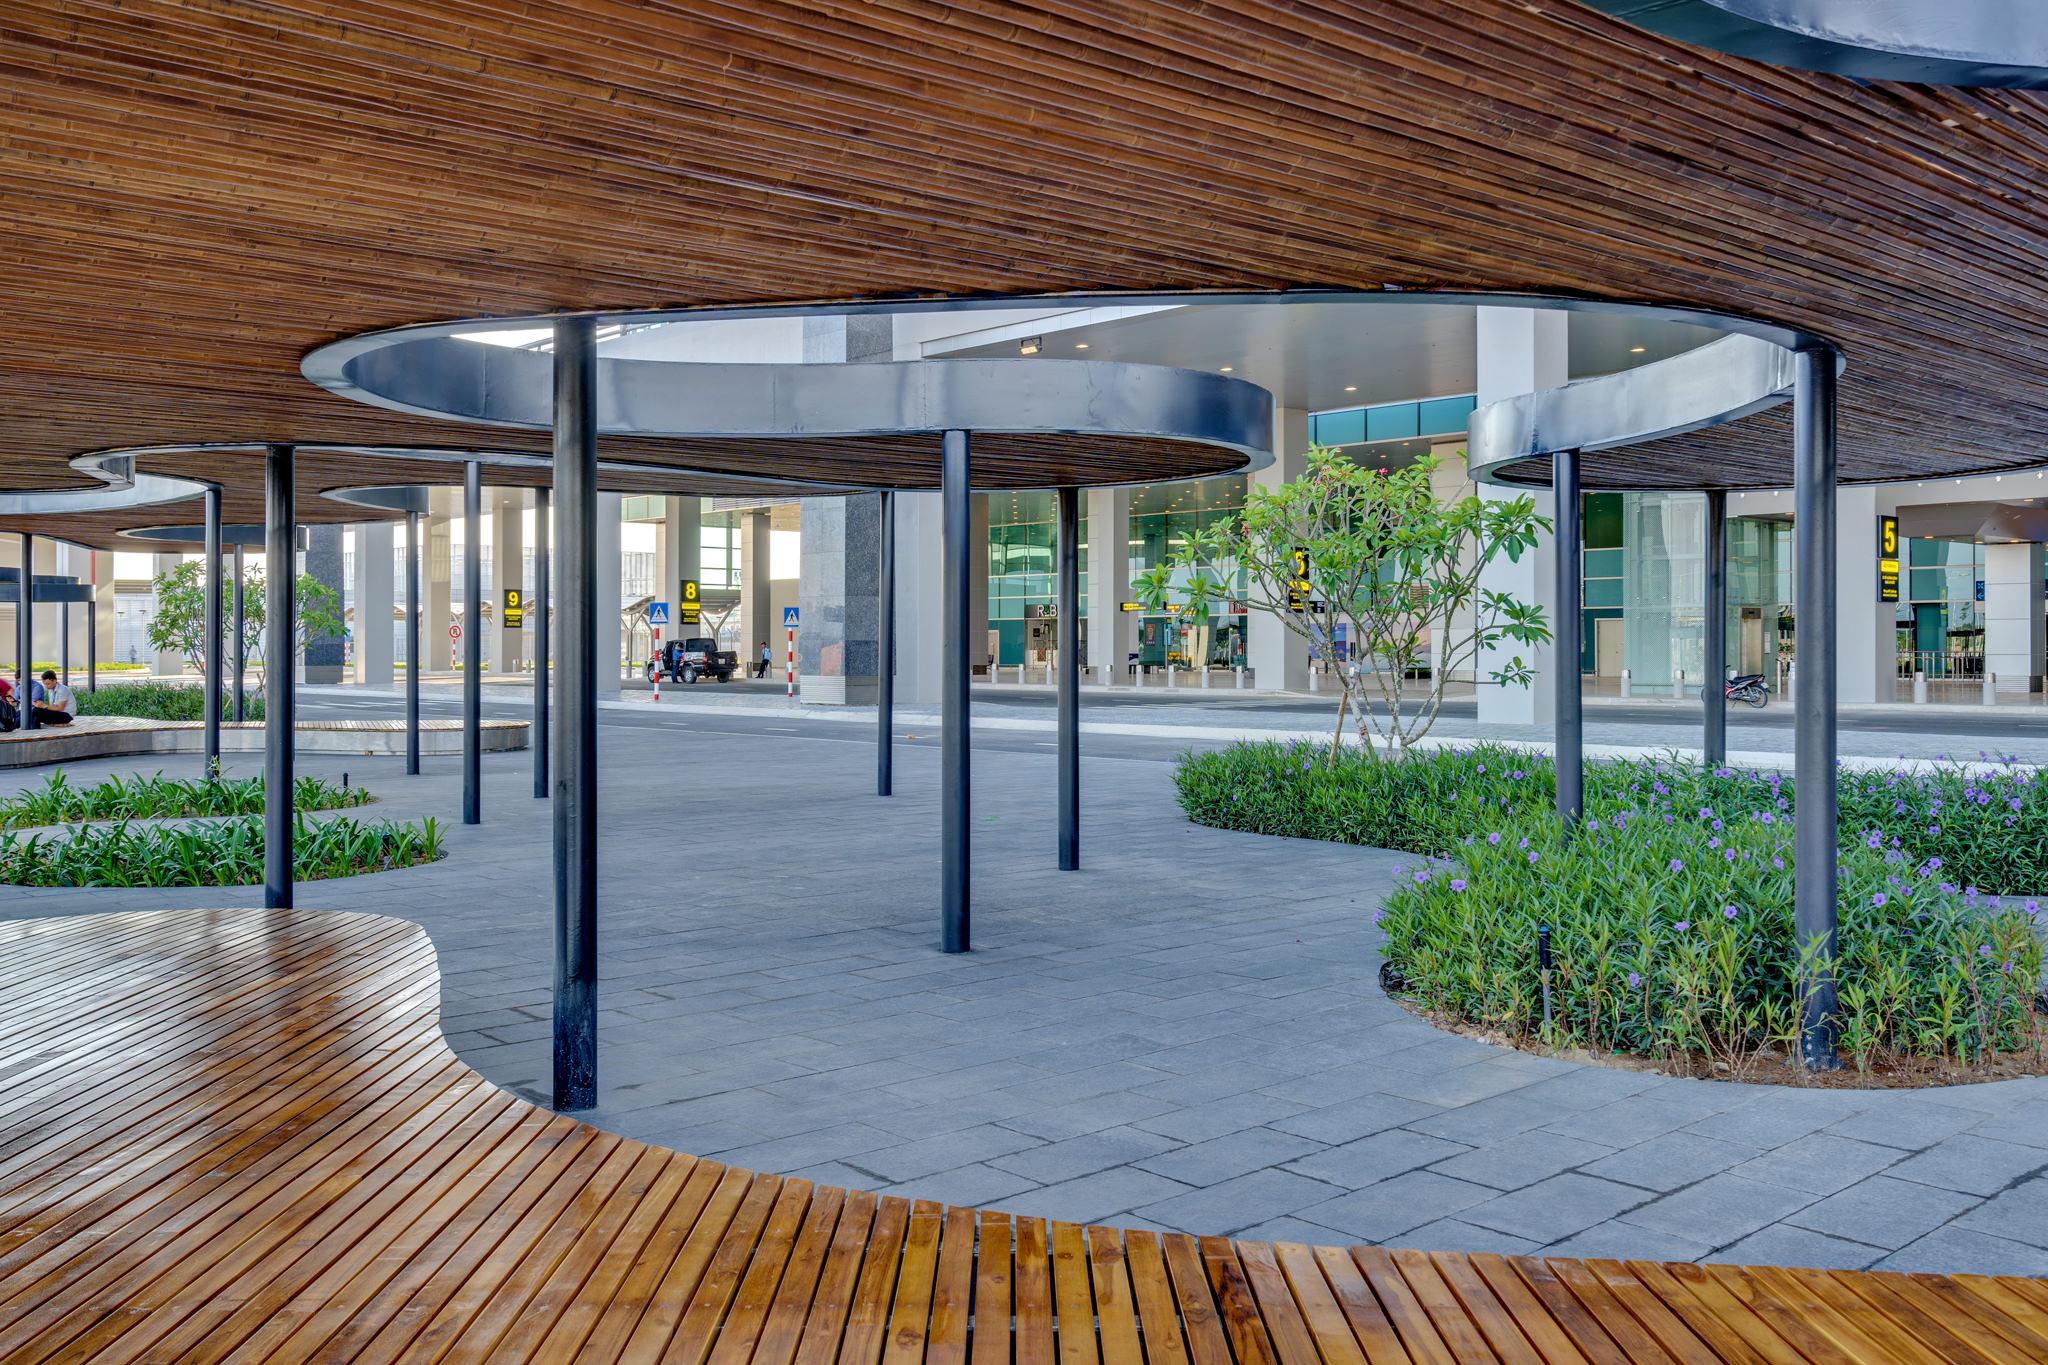 20180626 - Cam Ranh Airport - Architecture - 0112.jpg